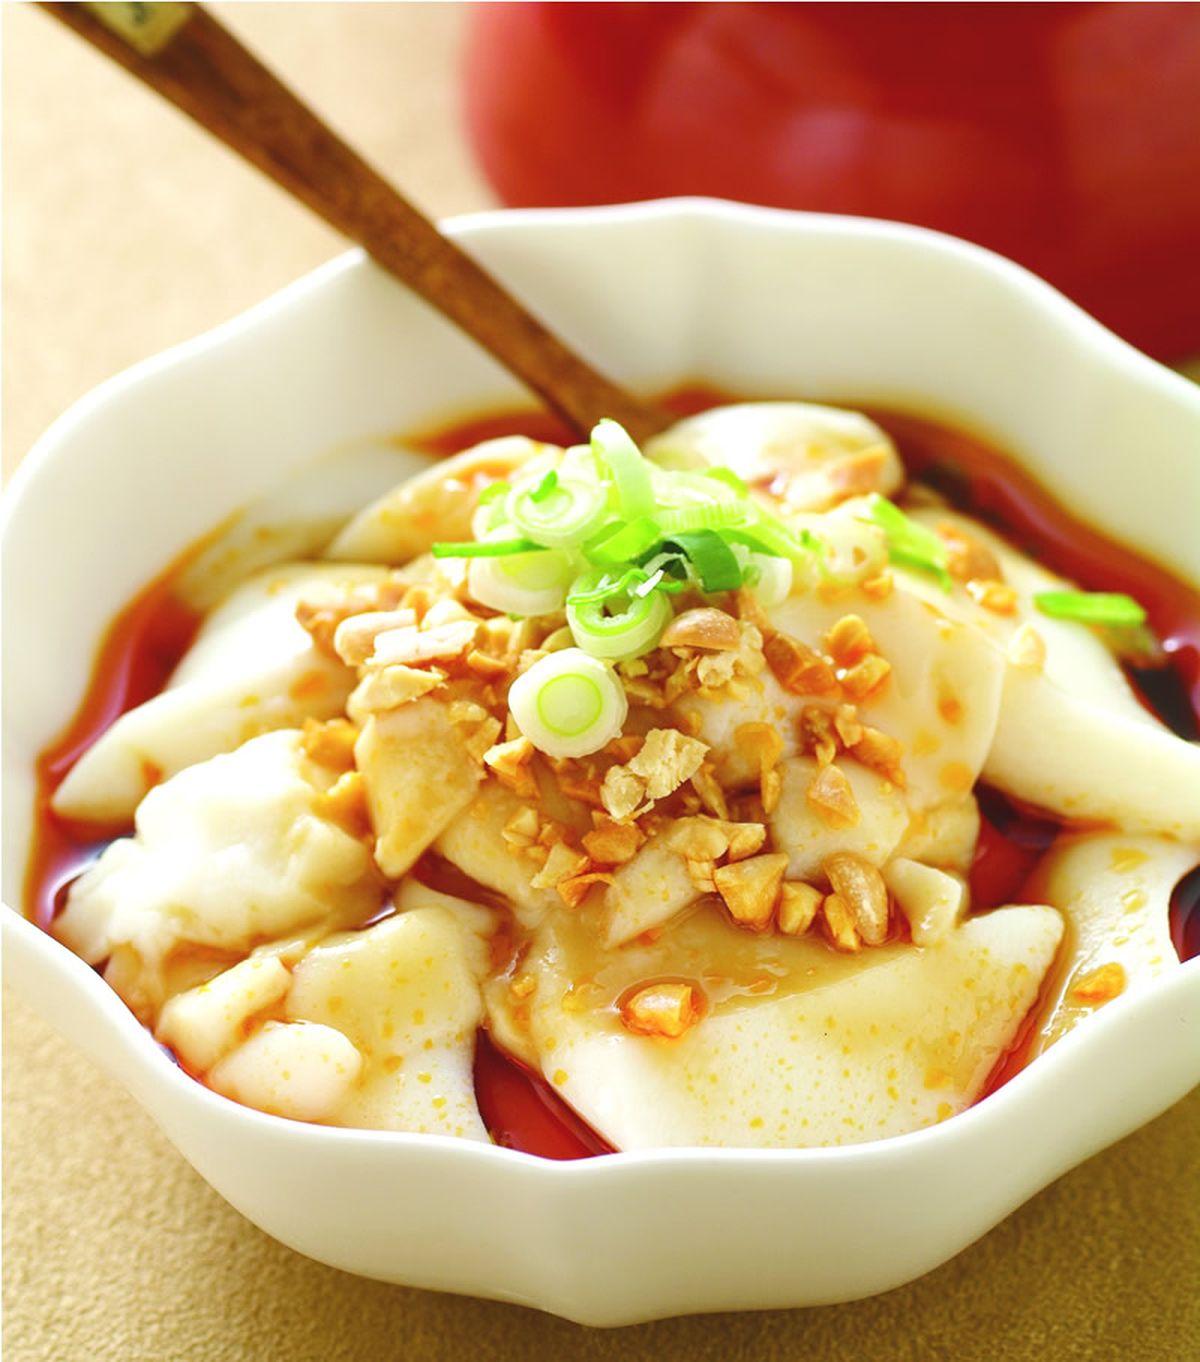 【食譜】酸辣豆腐腦:www.ytower.com.tw